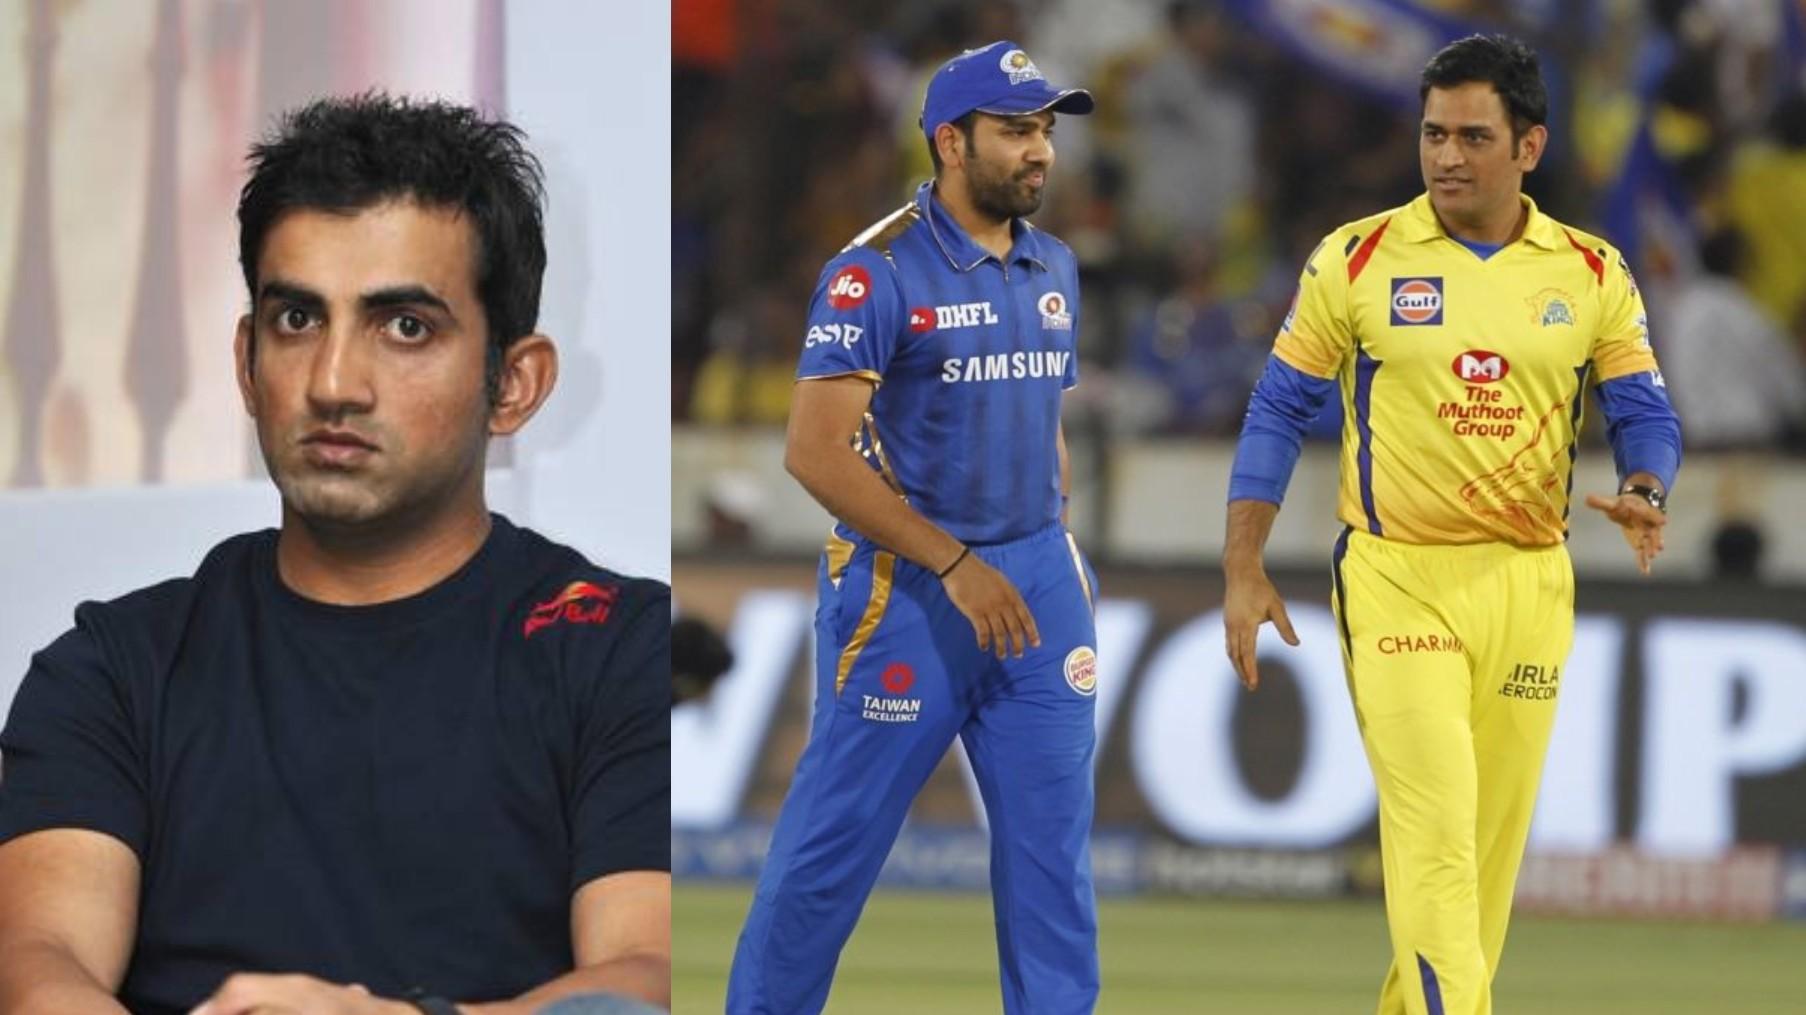 IPL 2020: Gautam Gambhir reveals why MI will have the upper hand against CSK in IPL 13 opener